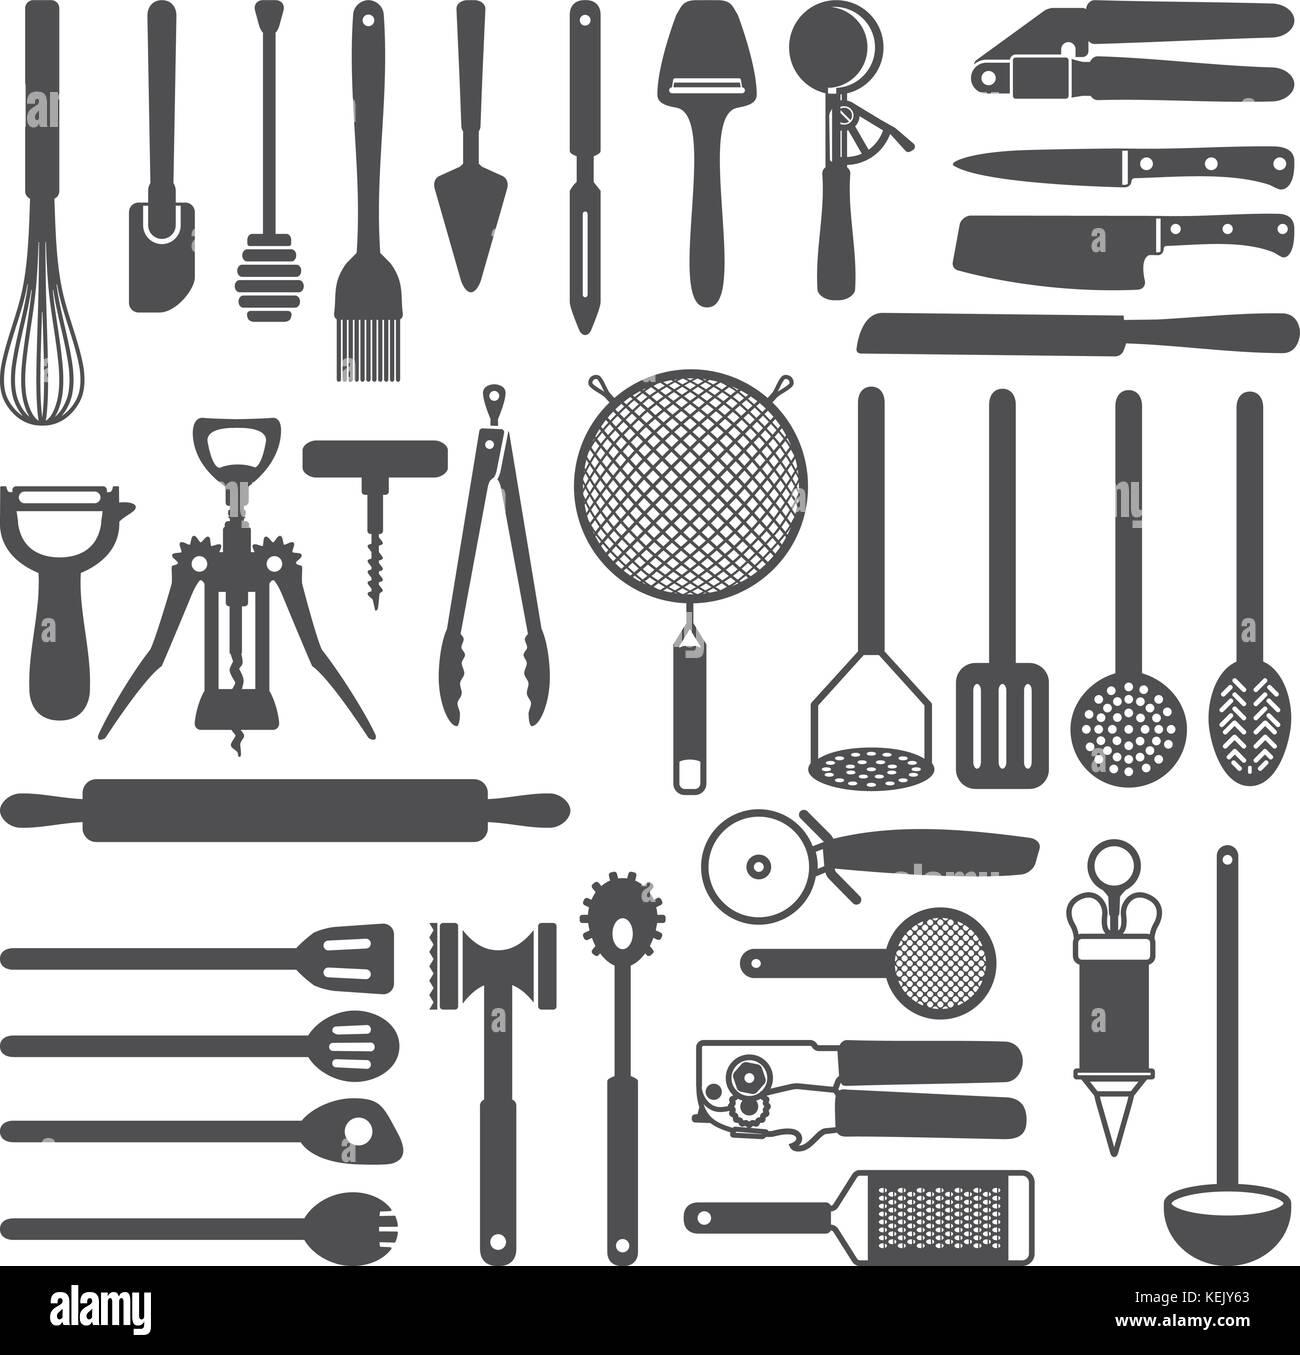 Various kitchen utensils vector silhouette icons set. - Stock Vector